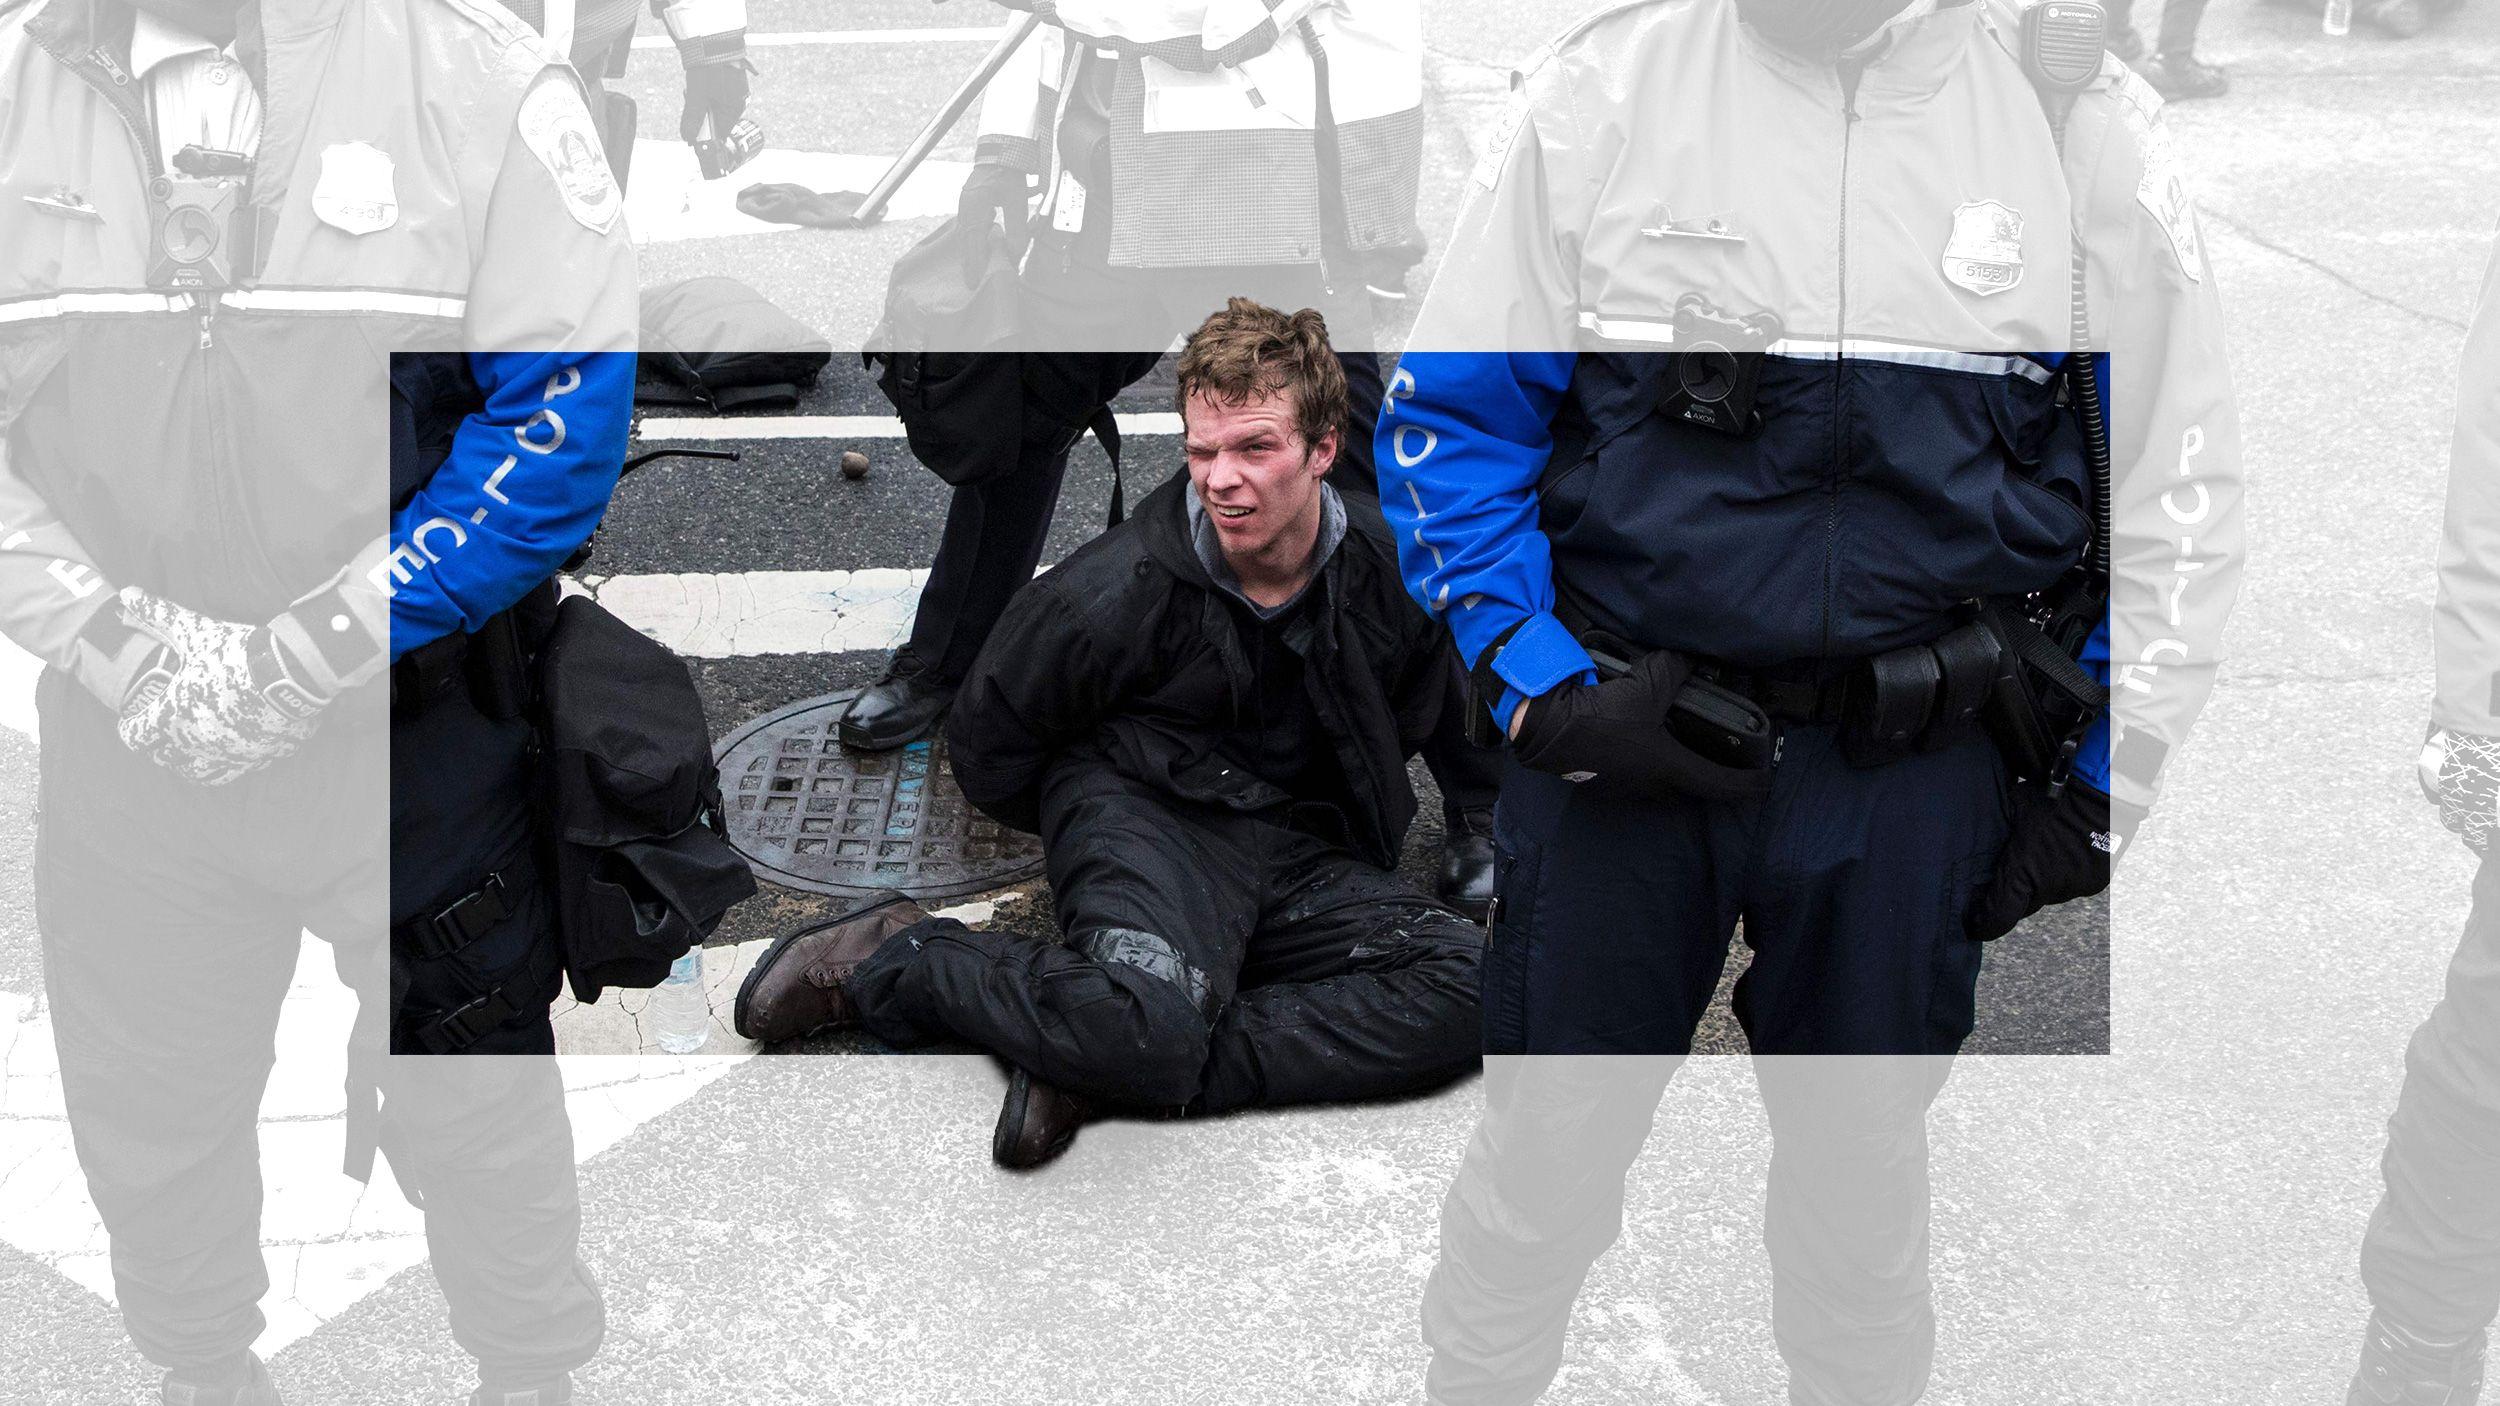 the latest cdf4a b1f21 1491894200-es-041017-inaugurationprotestj20-lede.jpg